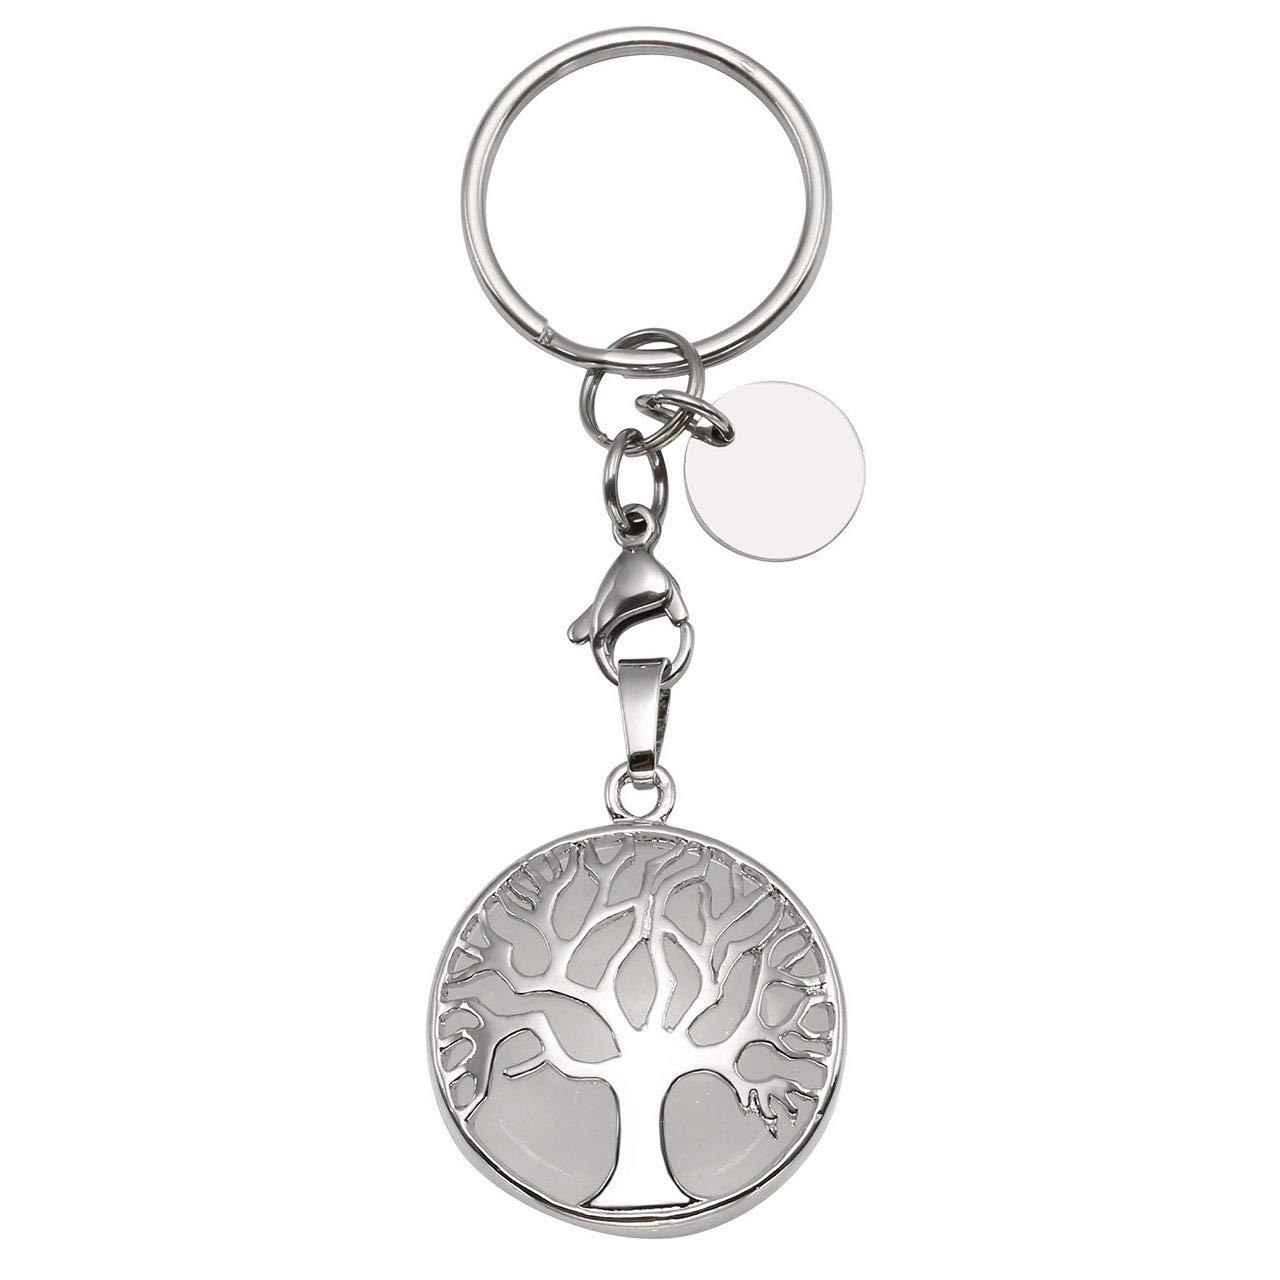 CrystalTears Tree of Life Keychain Semiprecious Stone Reiki Healing Crystals Keyring Handbag Decor Hanging Ornament